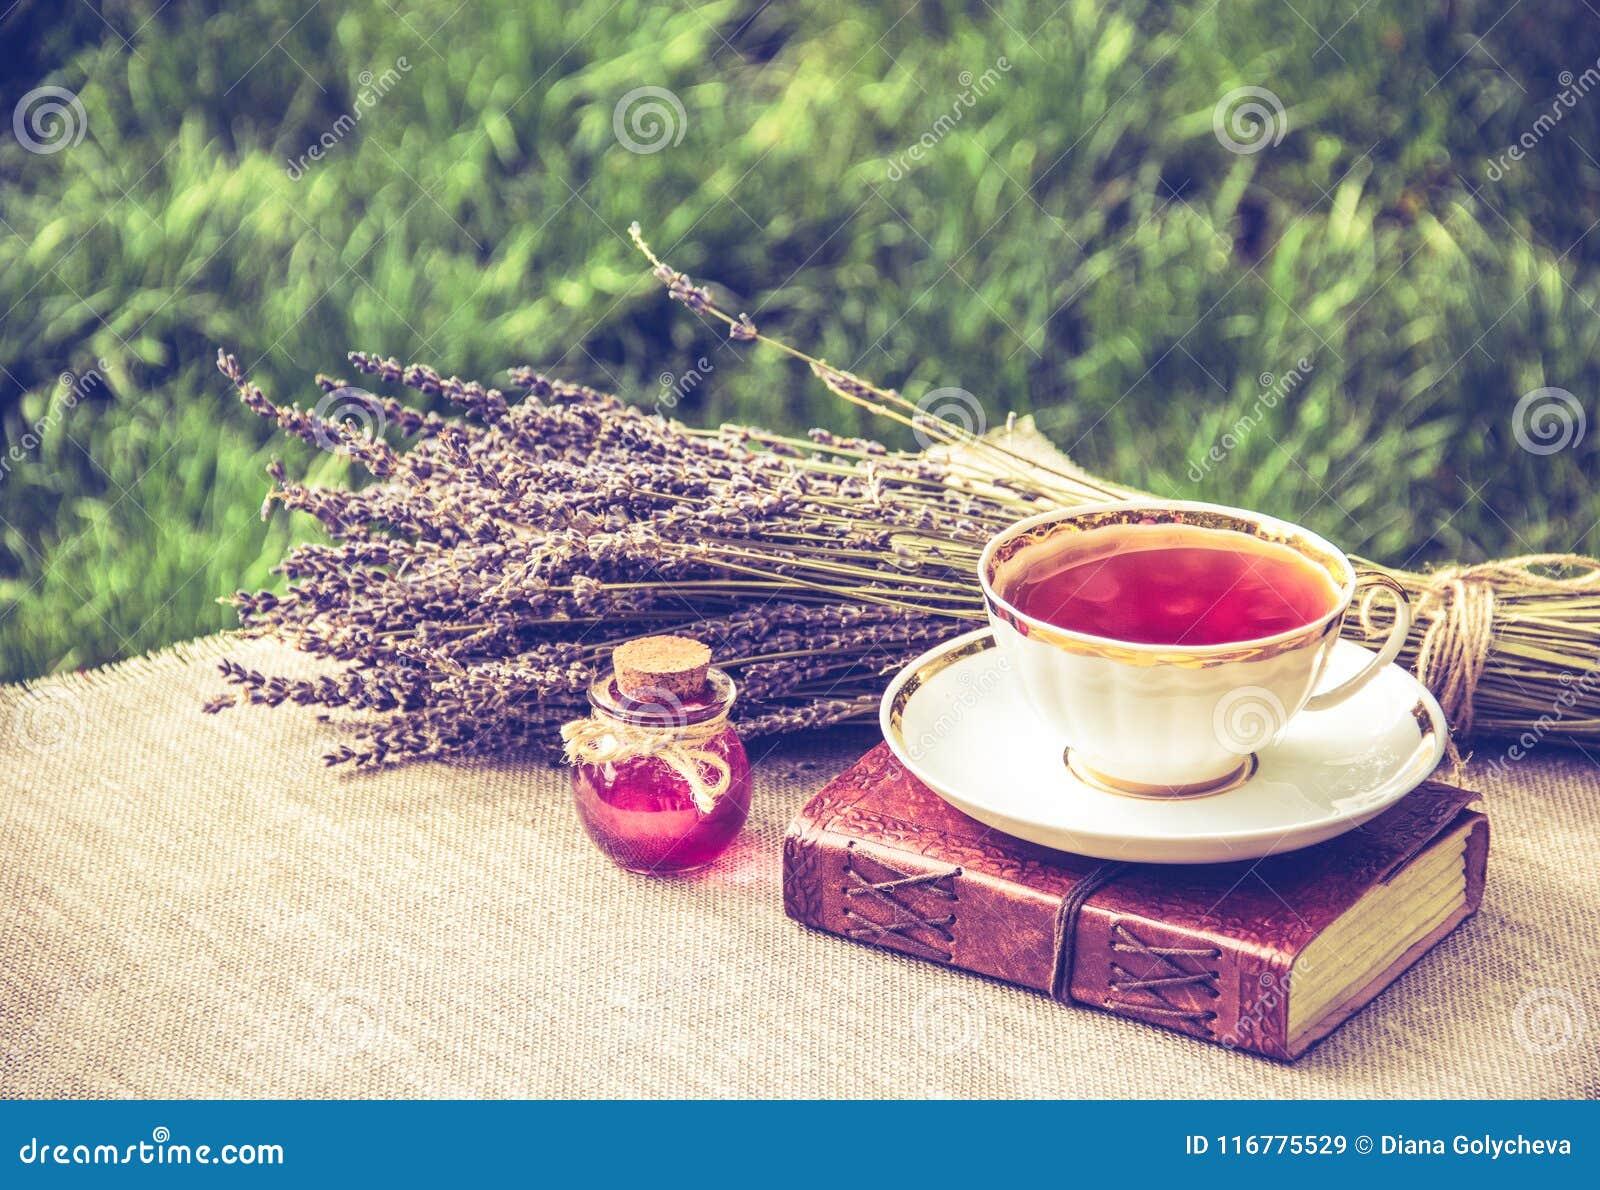 Is tea useful? 76